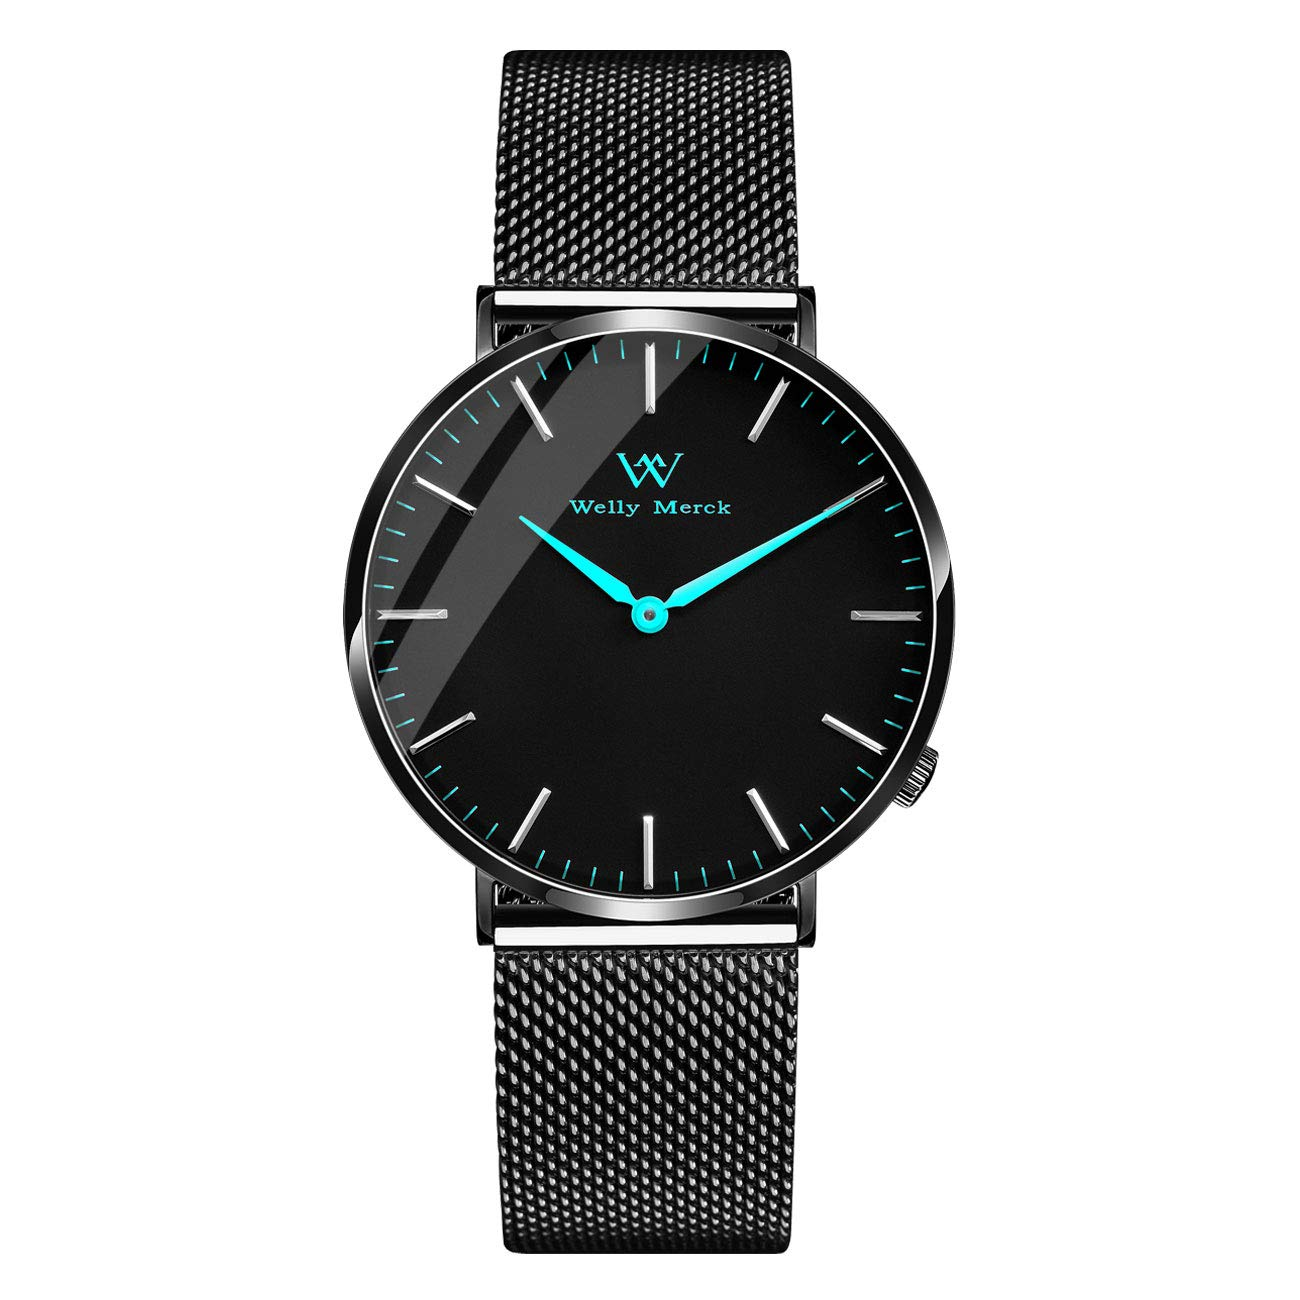 327621718 Welly Merck Swiss Movement Sapphire Crystal 42mm Men Luxury Watch Minimalist  Ultra Thin Analog Wrist Watch 20mm Stainless Steel Mesh Band 164ft Water ...